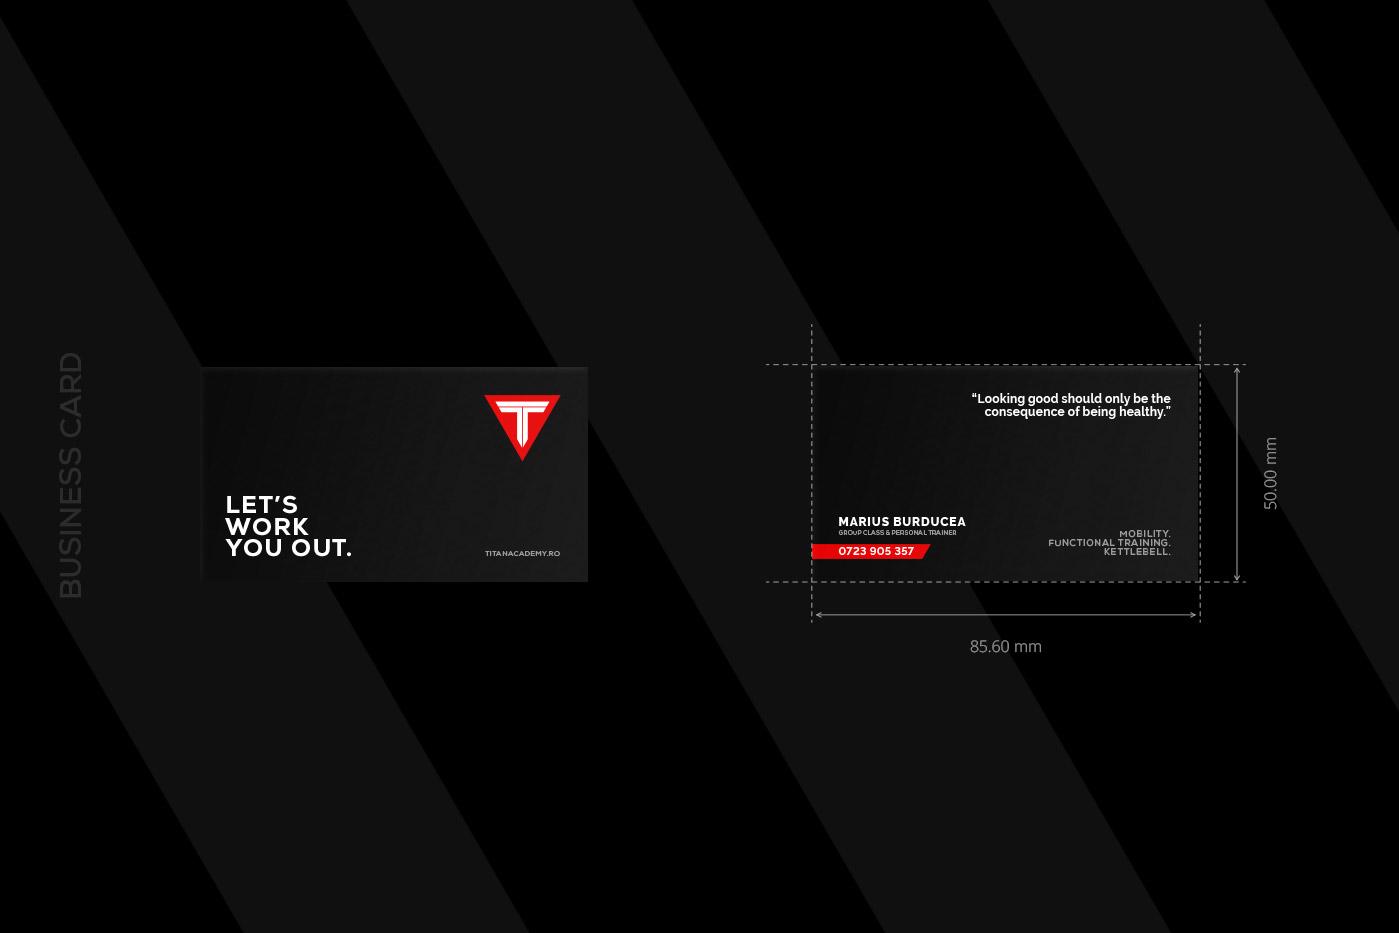 titan-academy-case-study-010.1.jpg